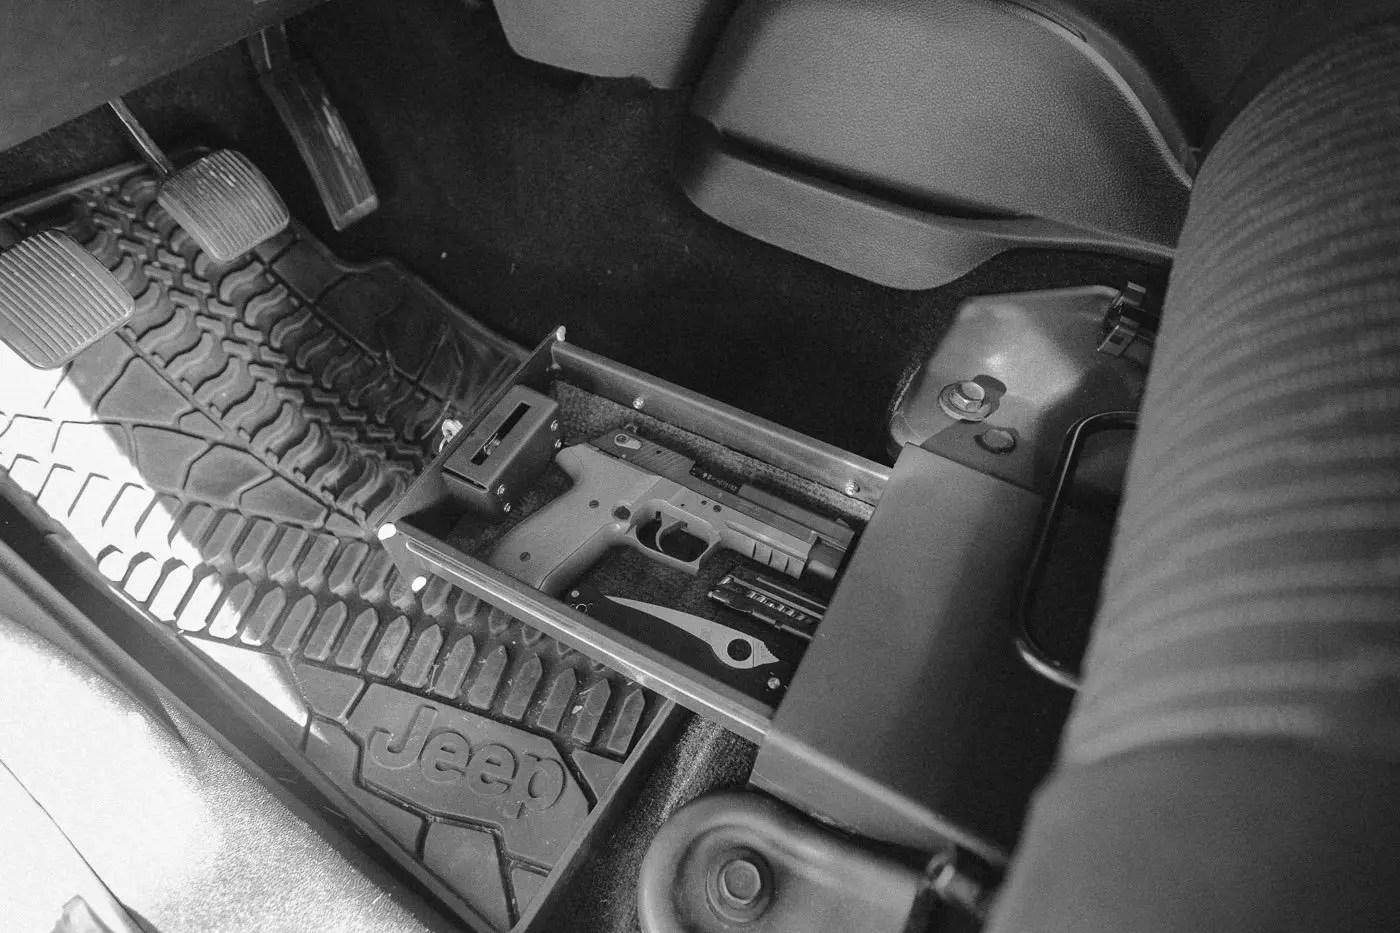 Bestop Highrock 4x4 Under Seat Lock Box For Wrangler Jku